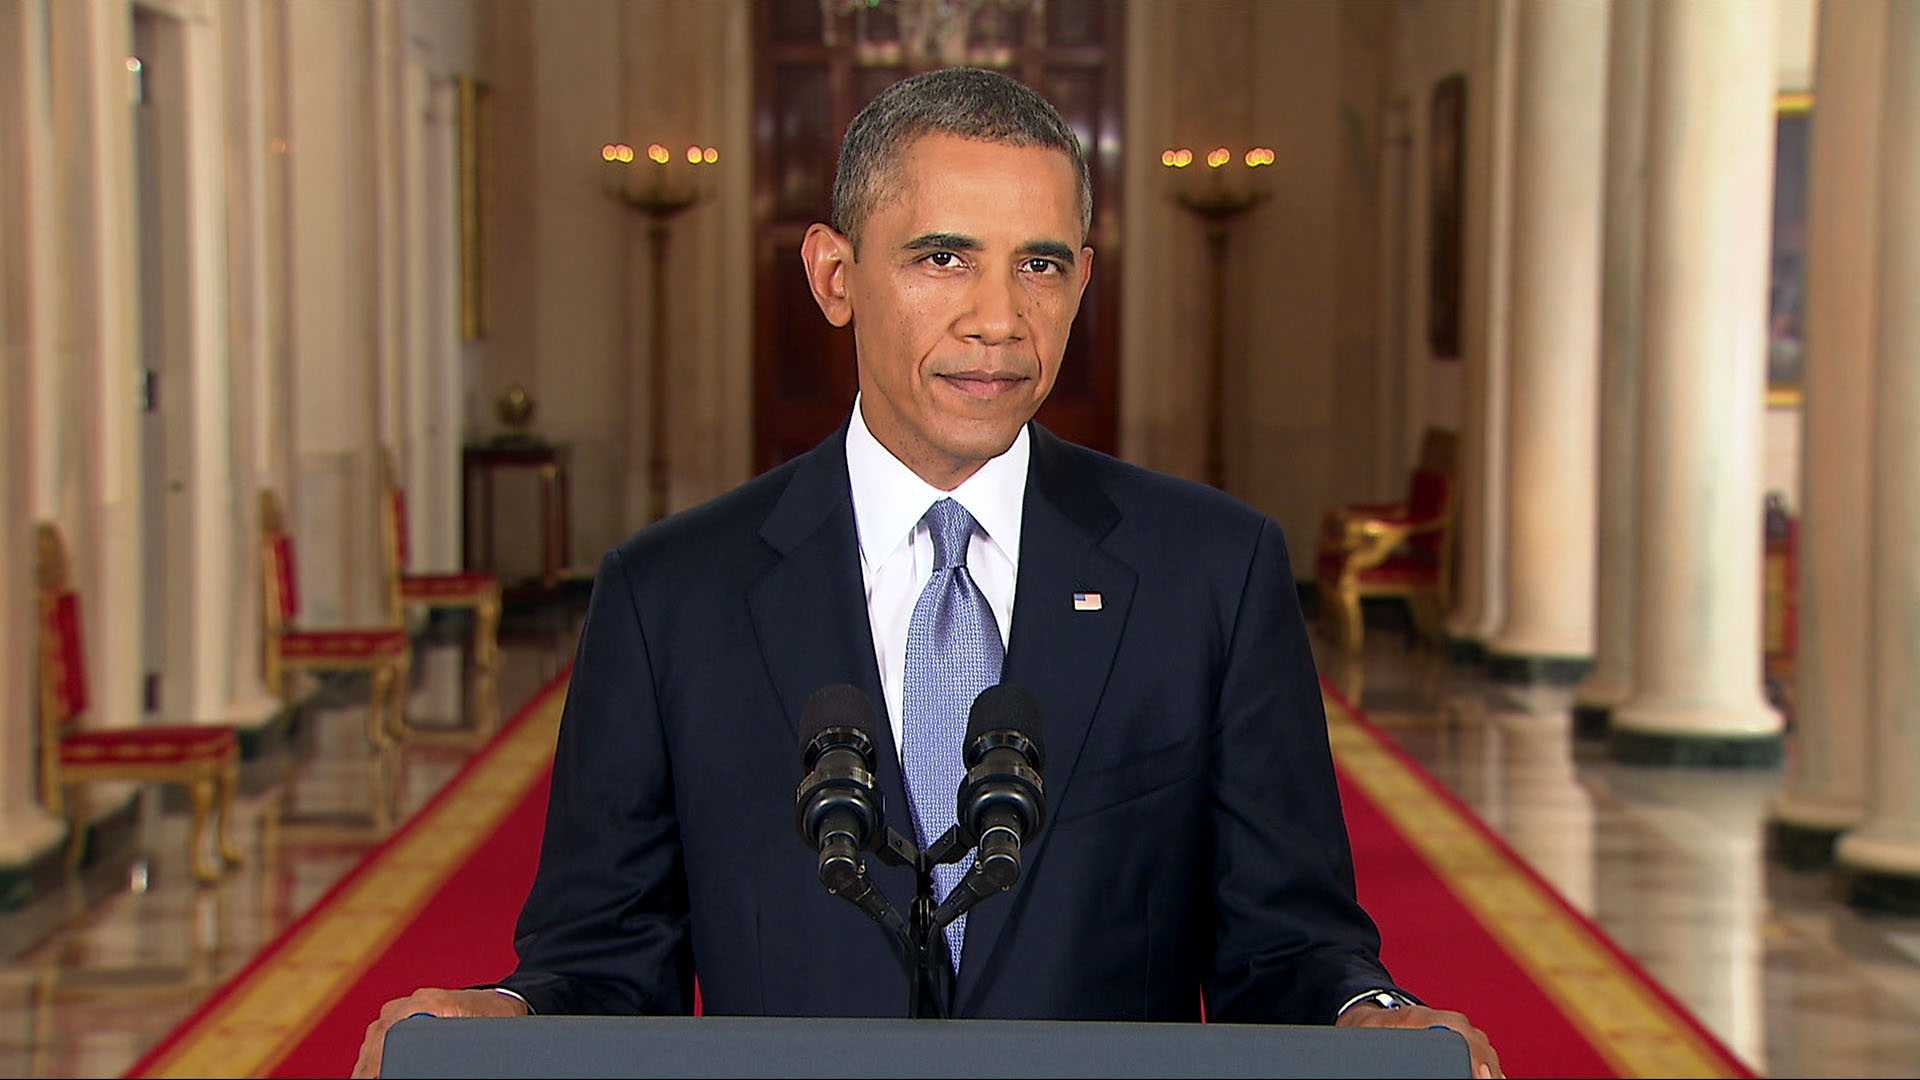 https://selfgovern.com/wp-content/uploads/2014/12/ObamaSpeech.jpg